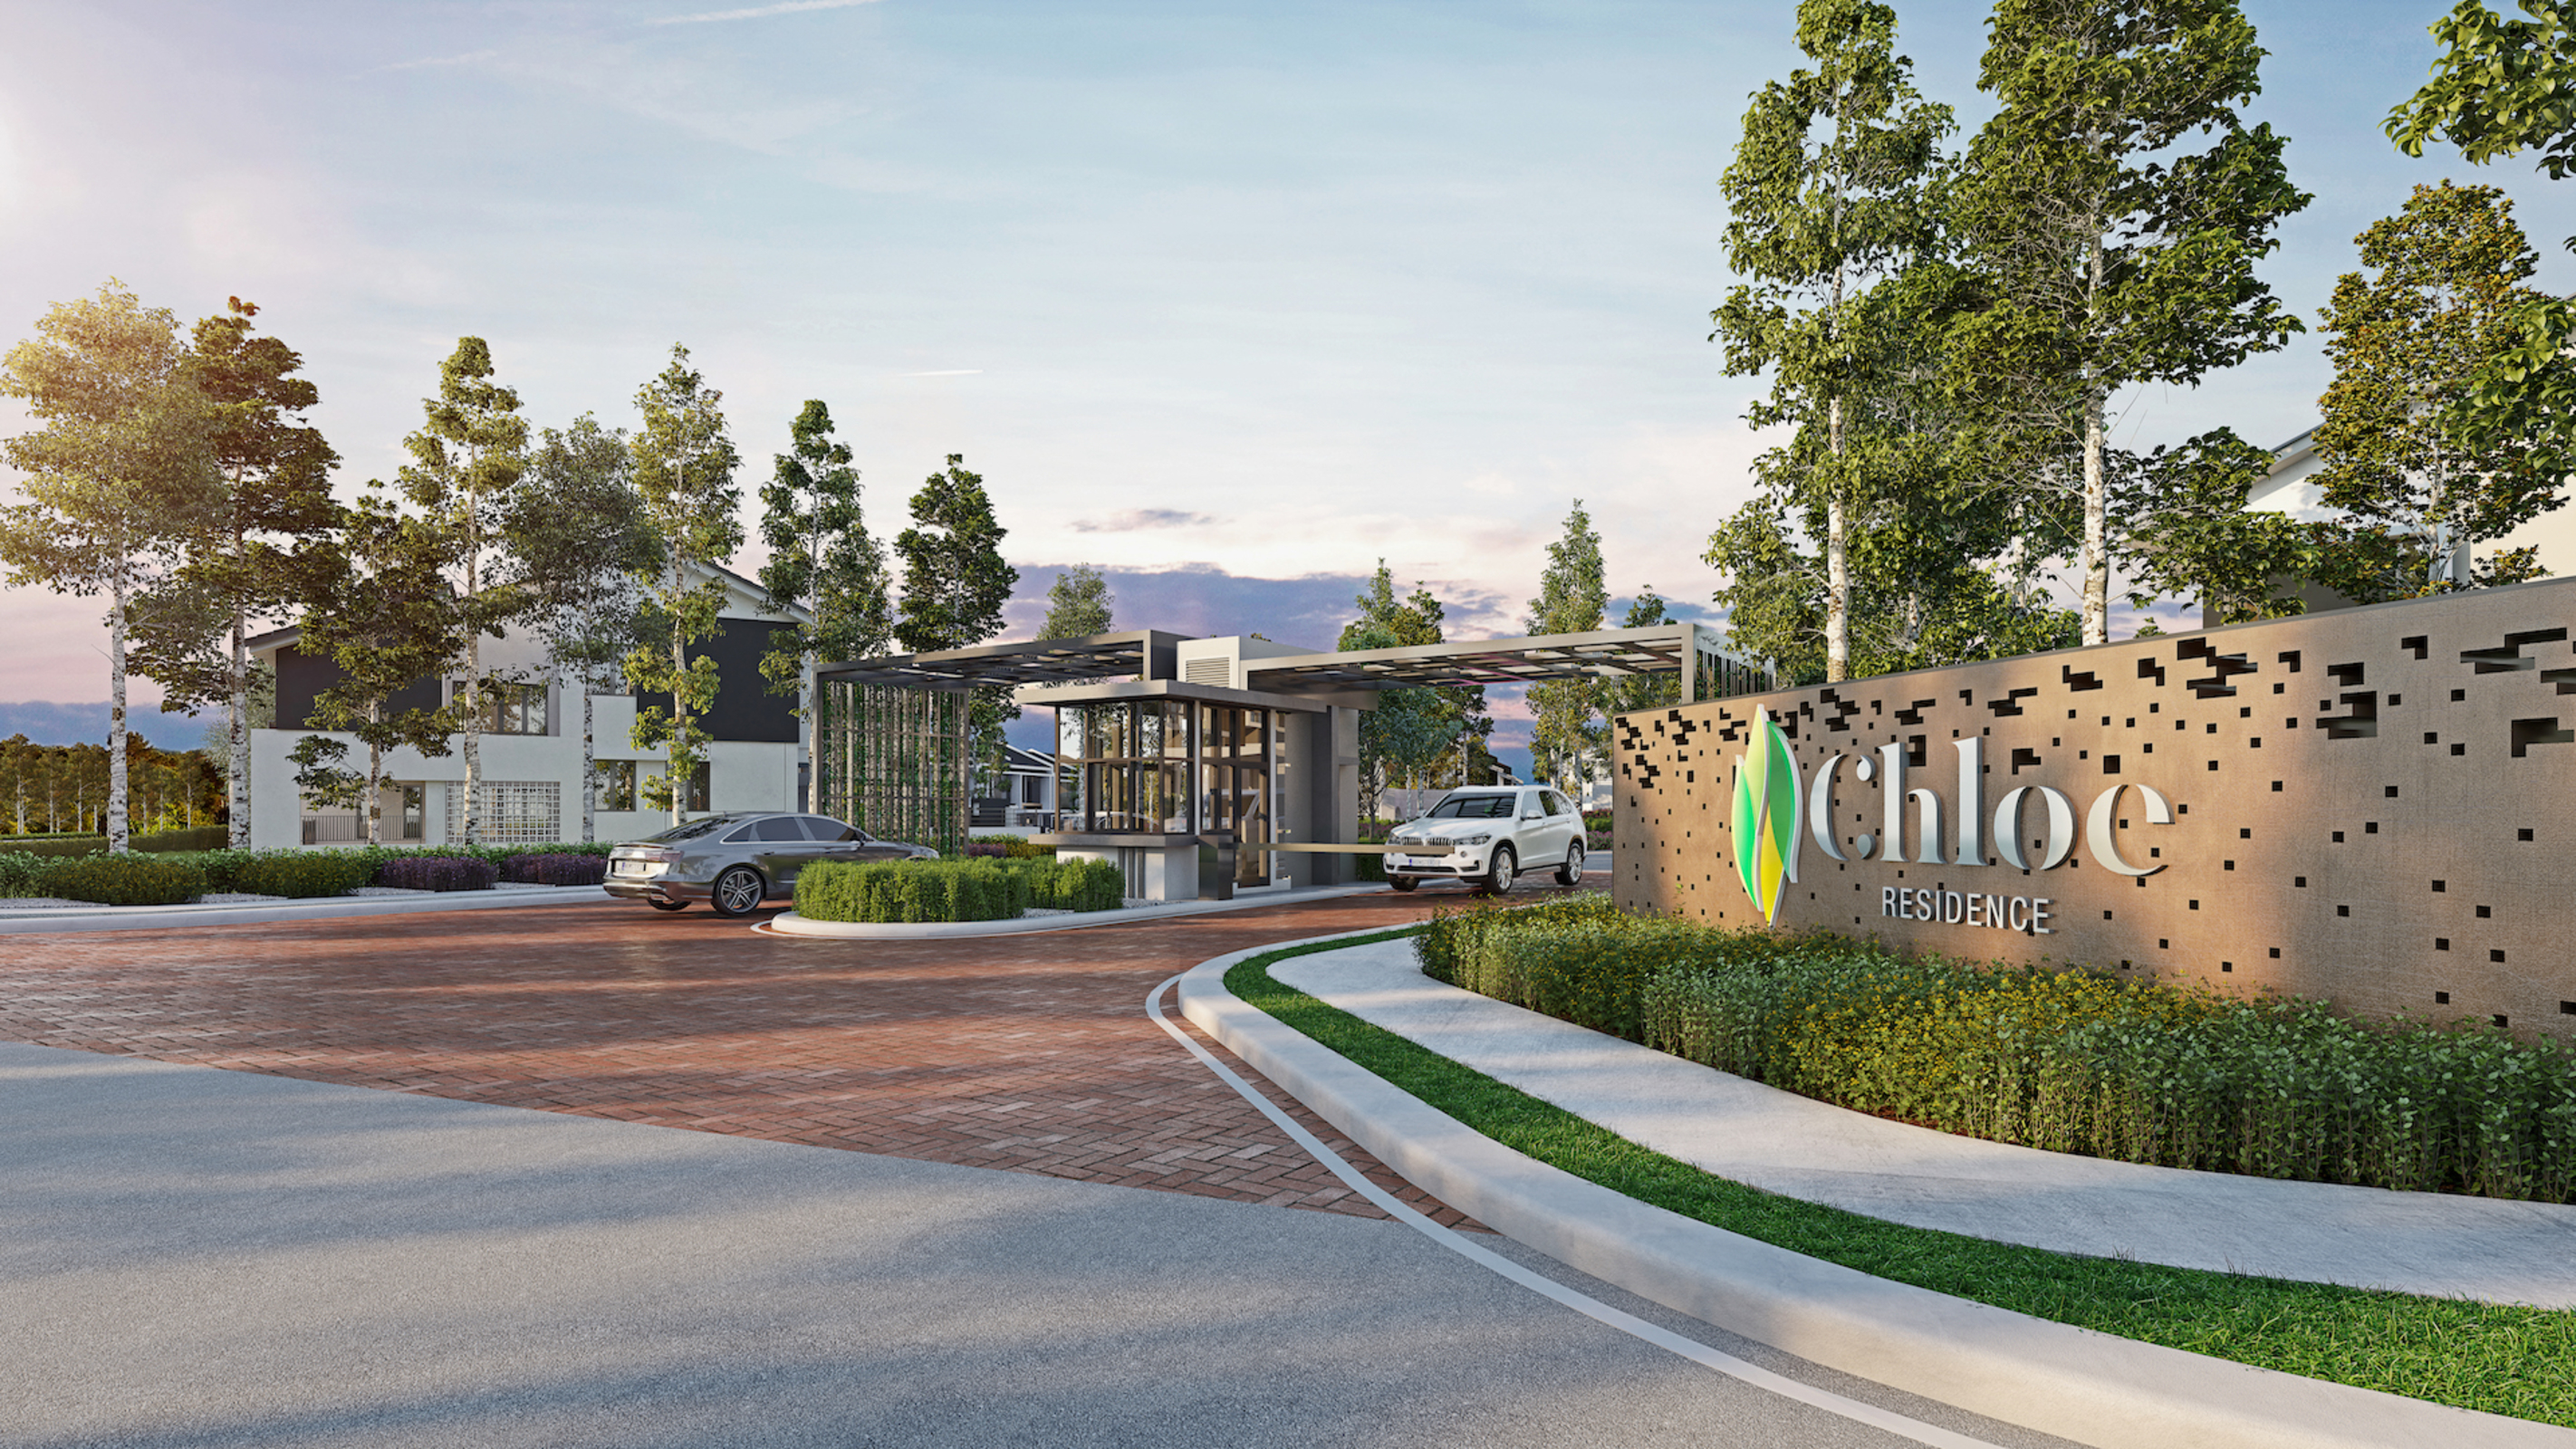 Rawang emerald west house for sale chloe residences chloe entrance guardhouse 3xl